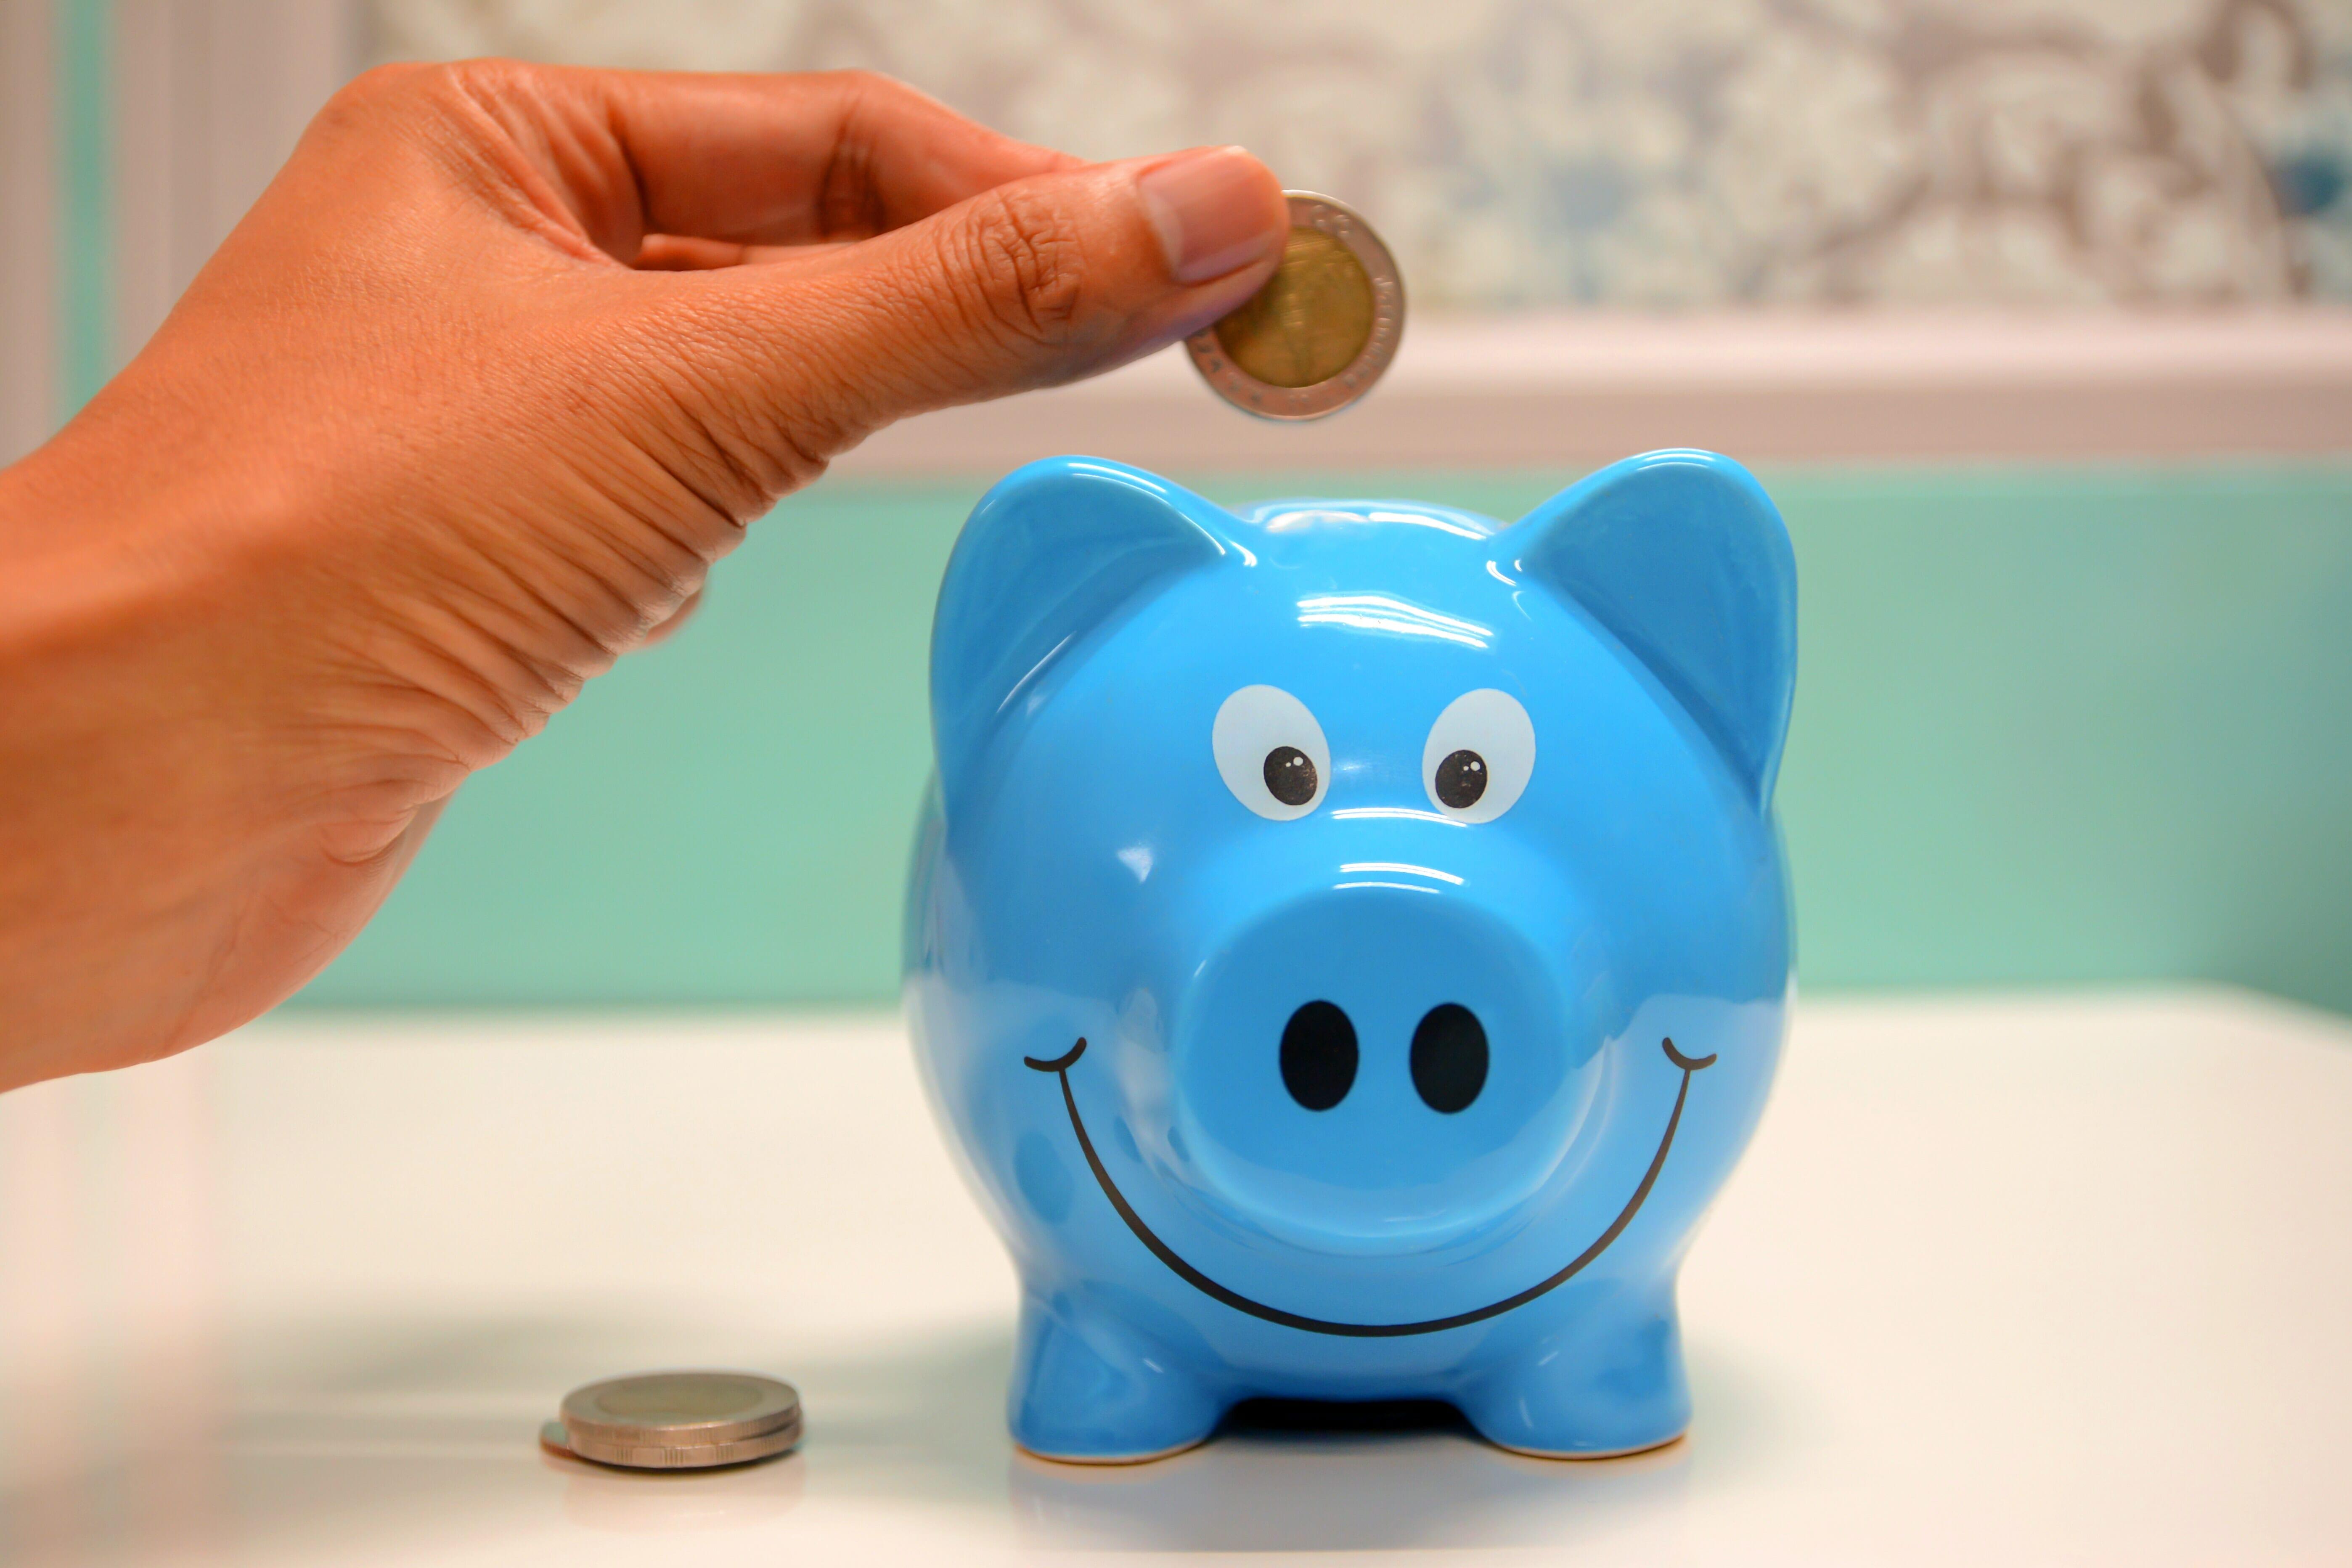 7 Money saving tips for university students